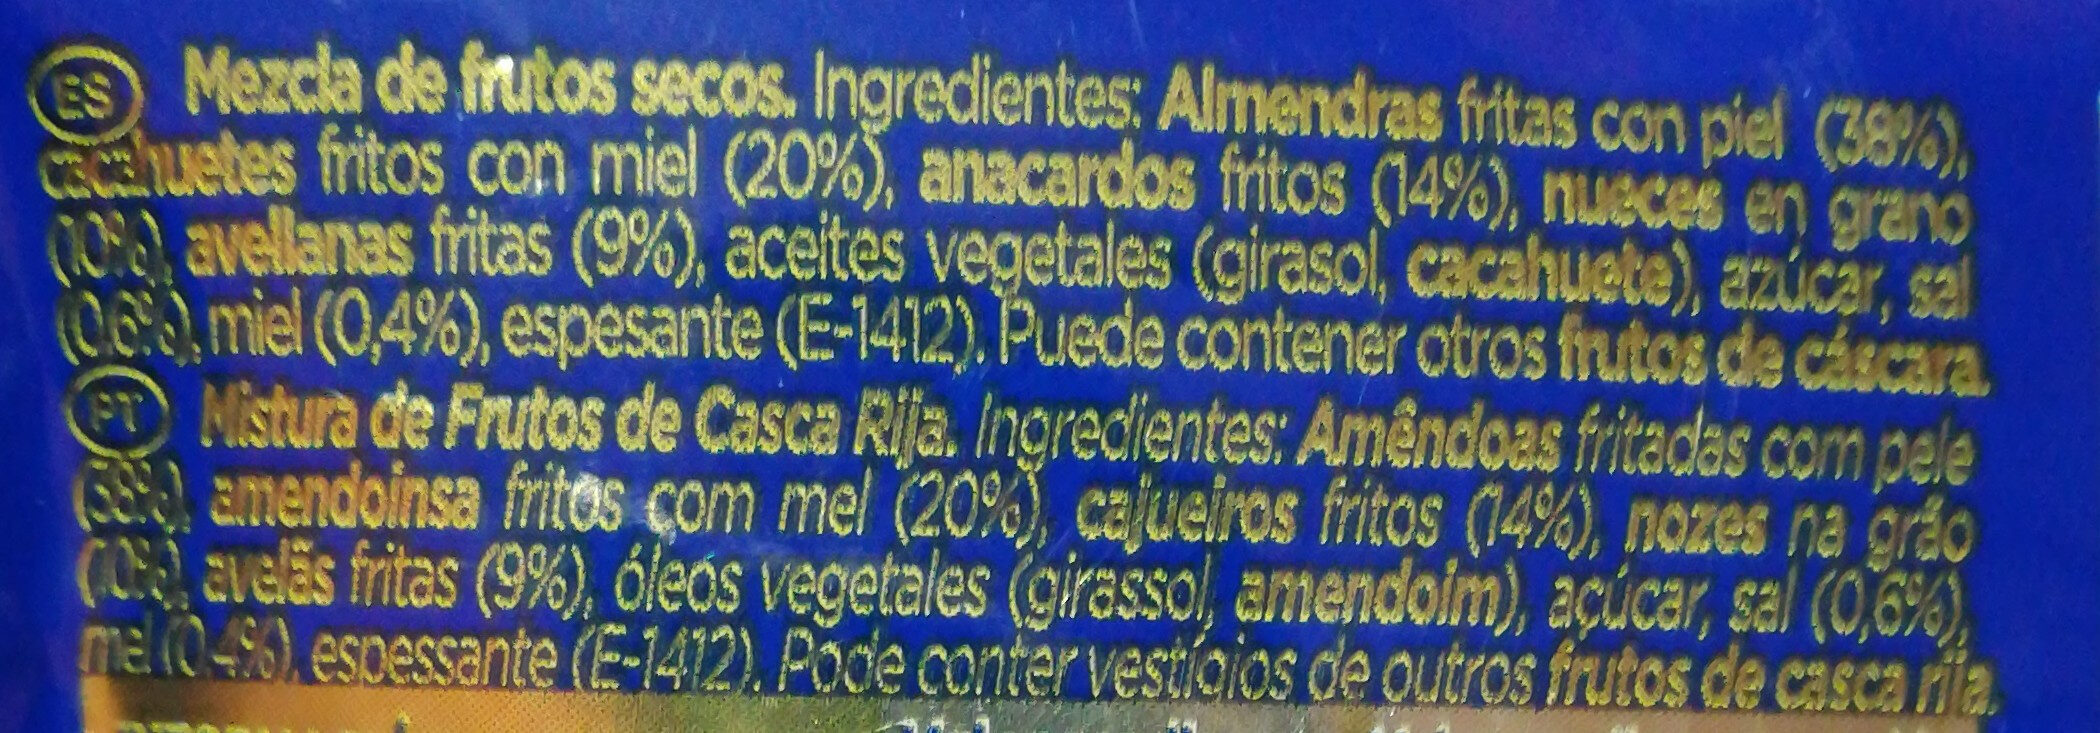 Cocktail deluxe - Ingredientes - es